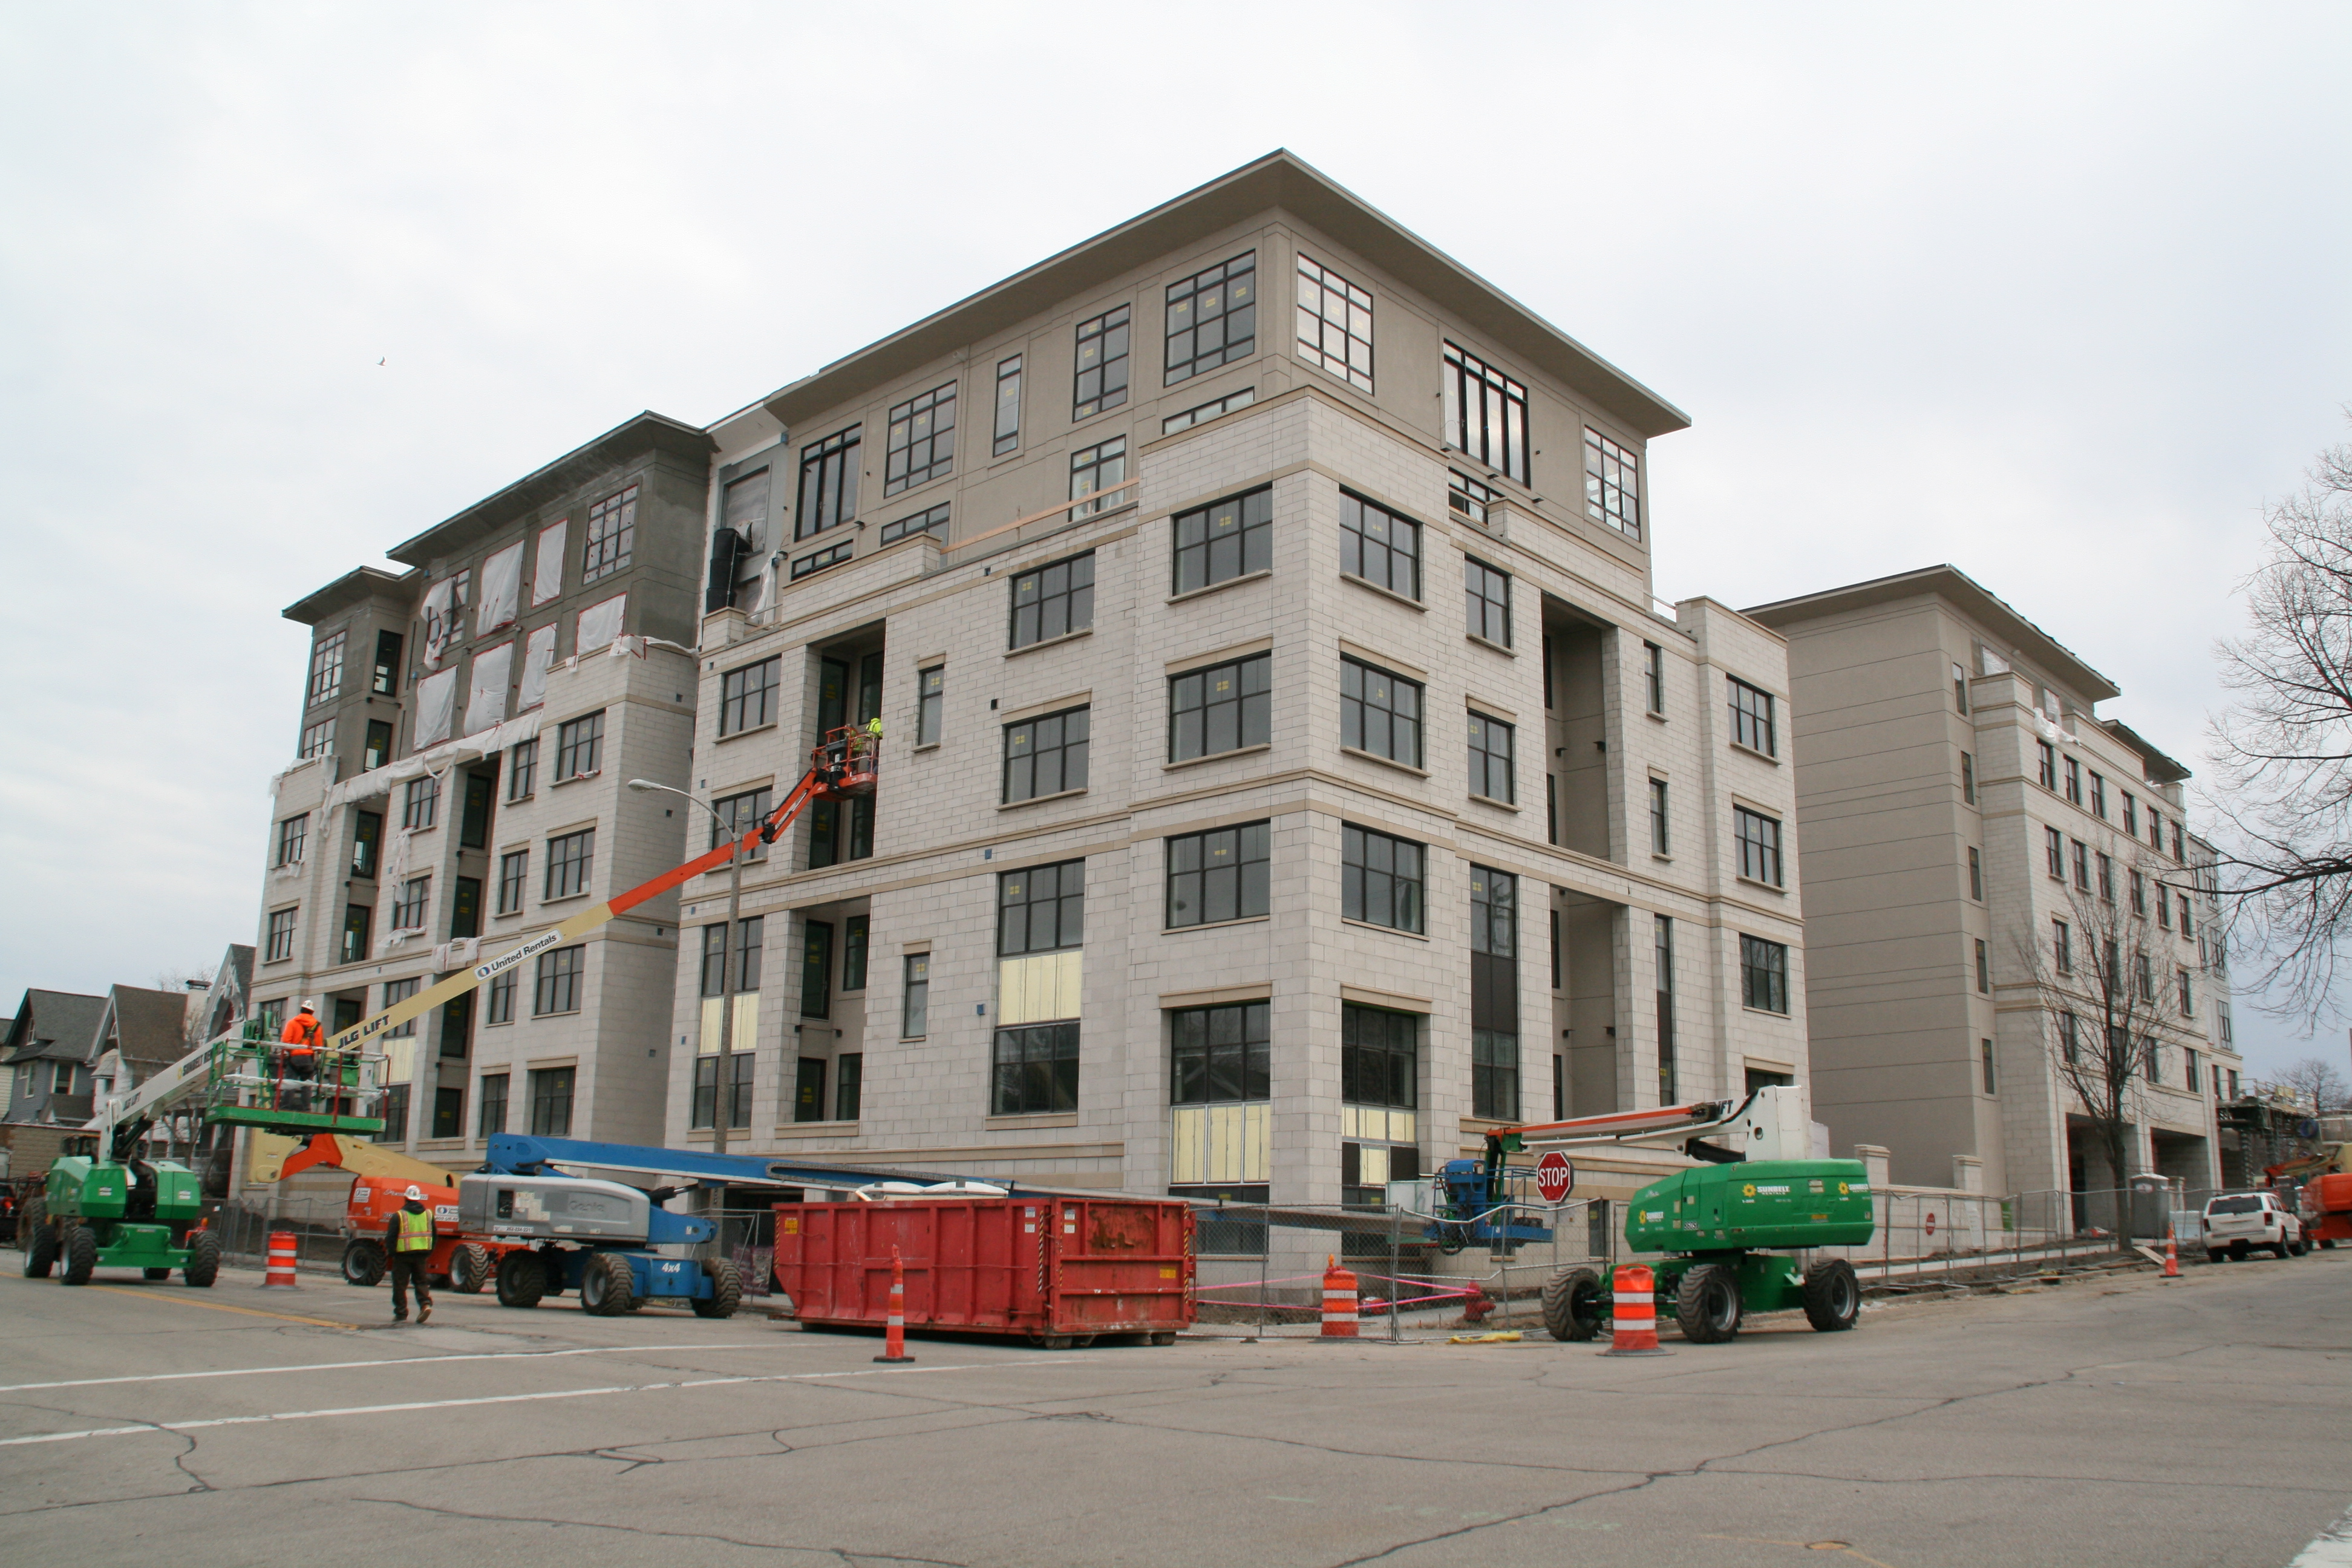 St. Rita Square complex under construction. Photo by Jeramey Jannene.